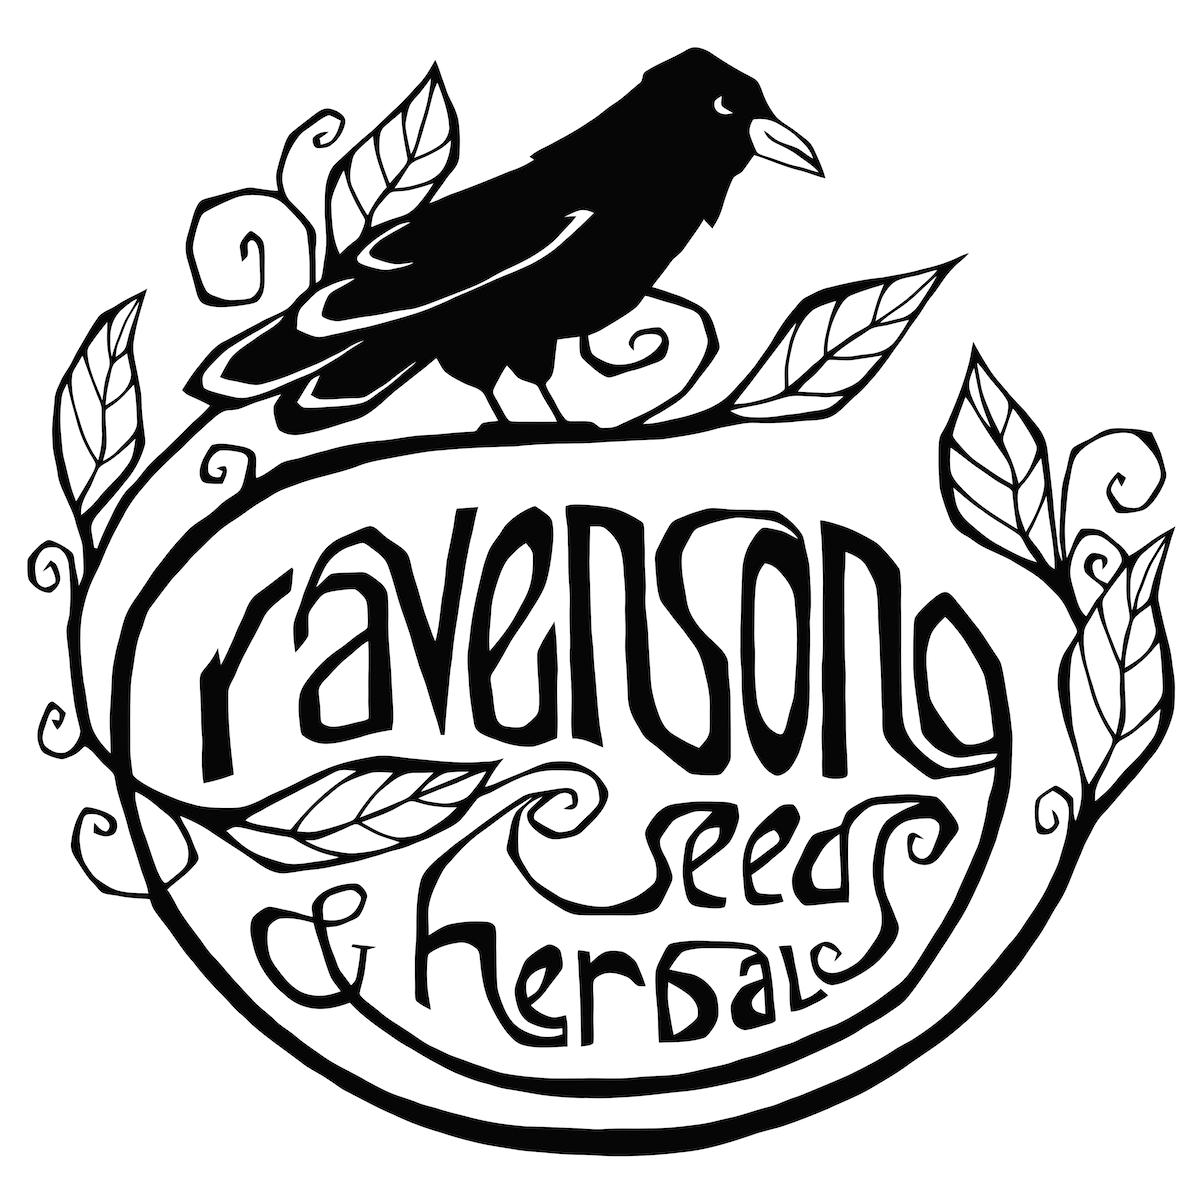 Ravensong Seeds & Herbals {Fireweed Farm} image